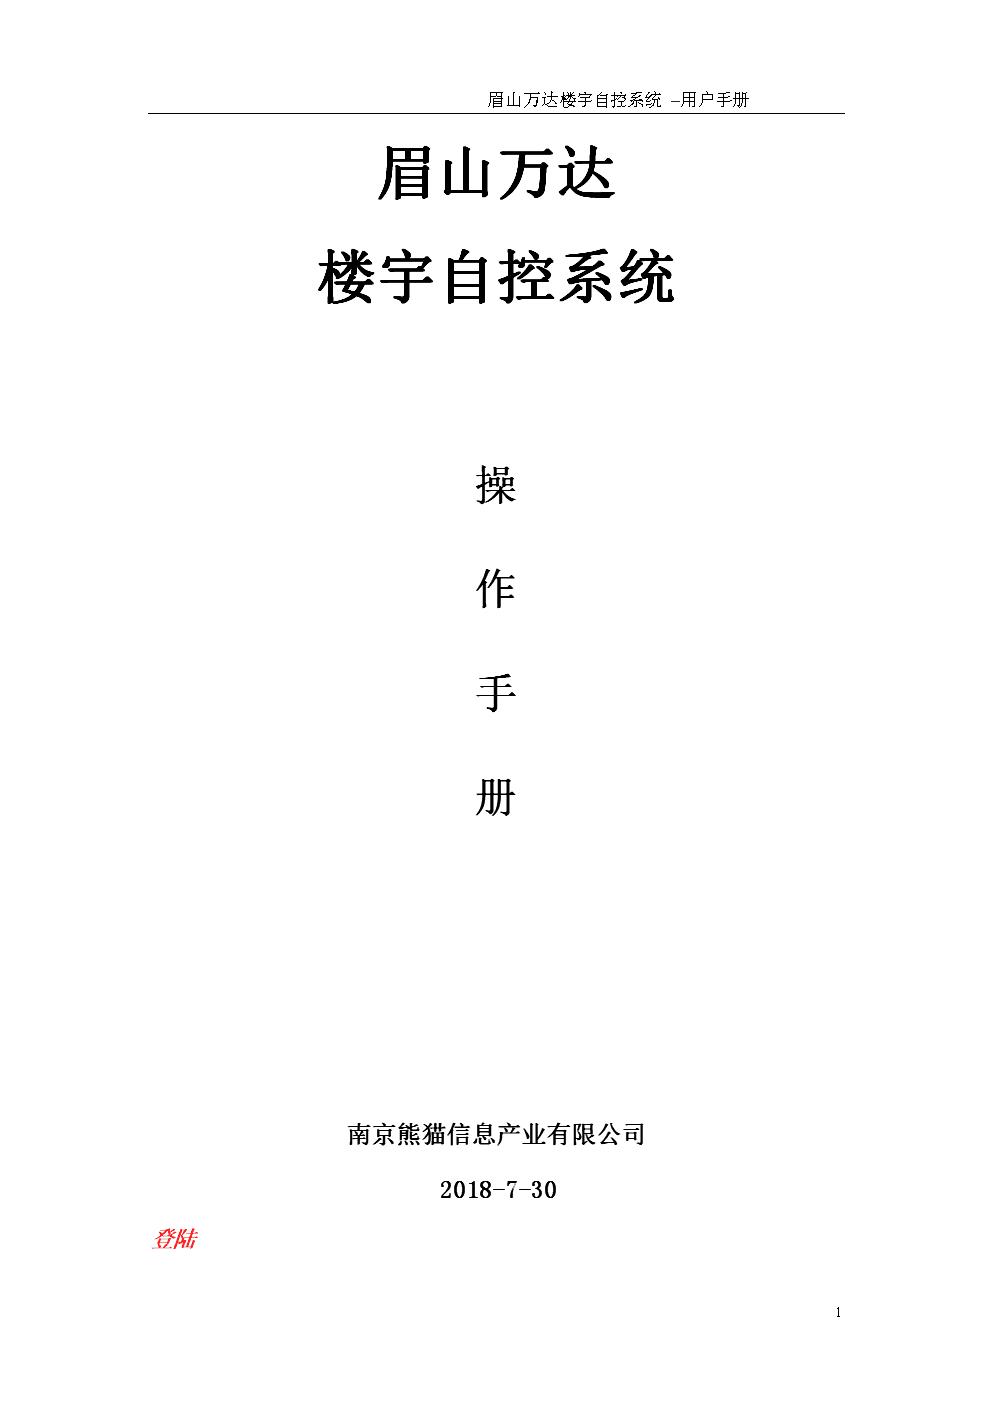 楼宇自控JC系统操作手册-MSWD.doc